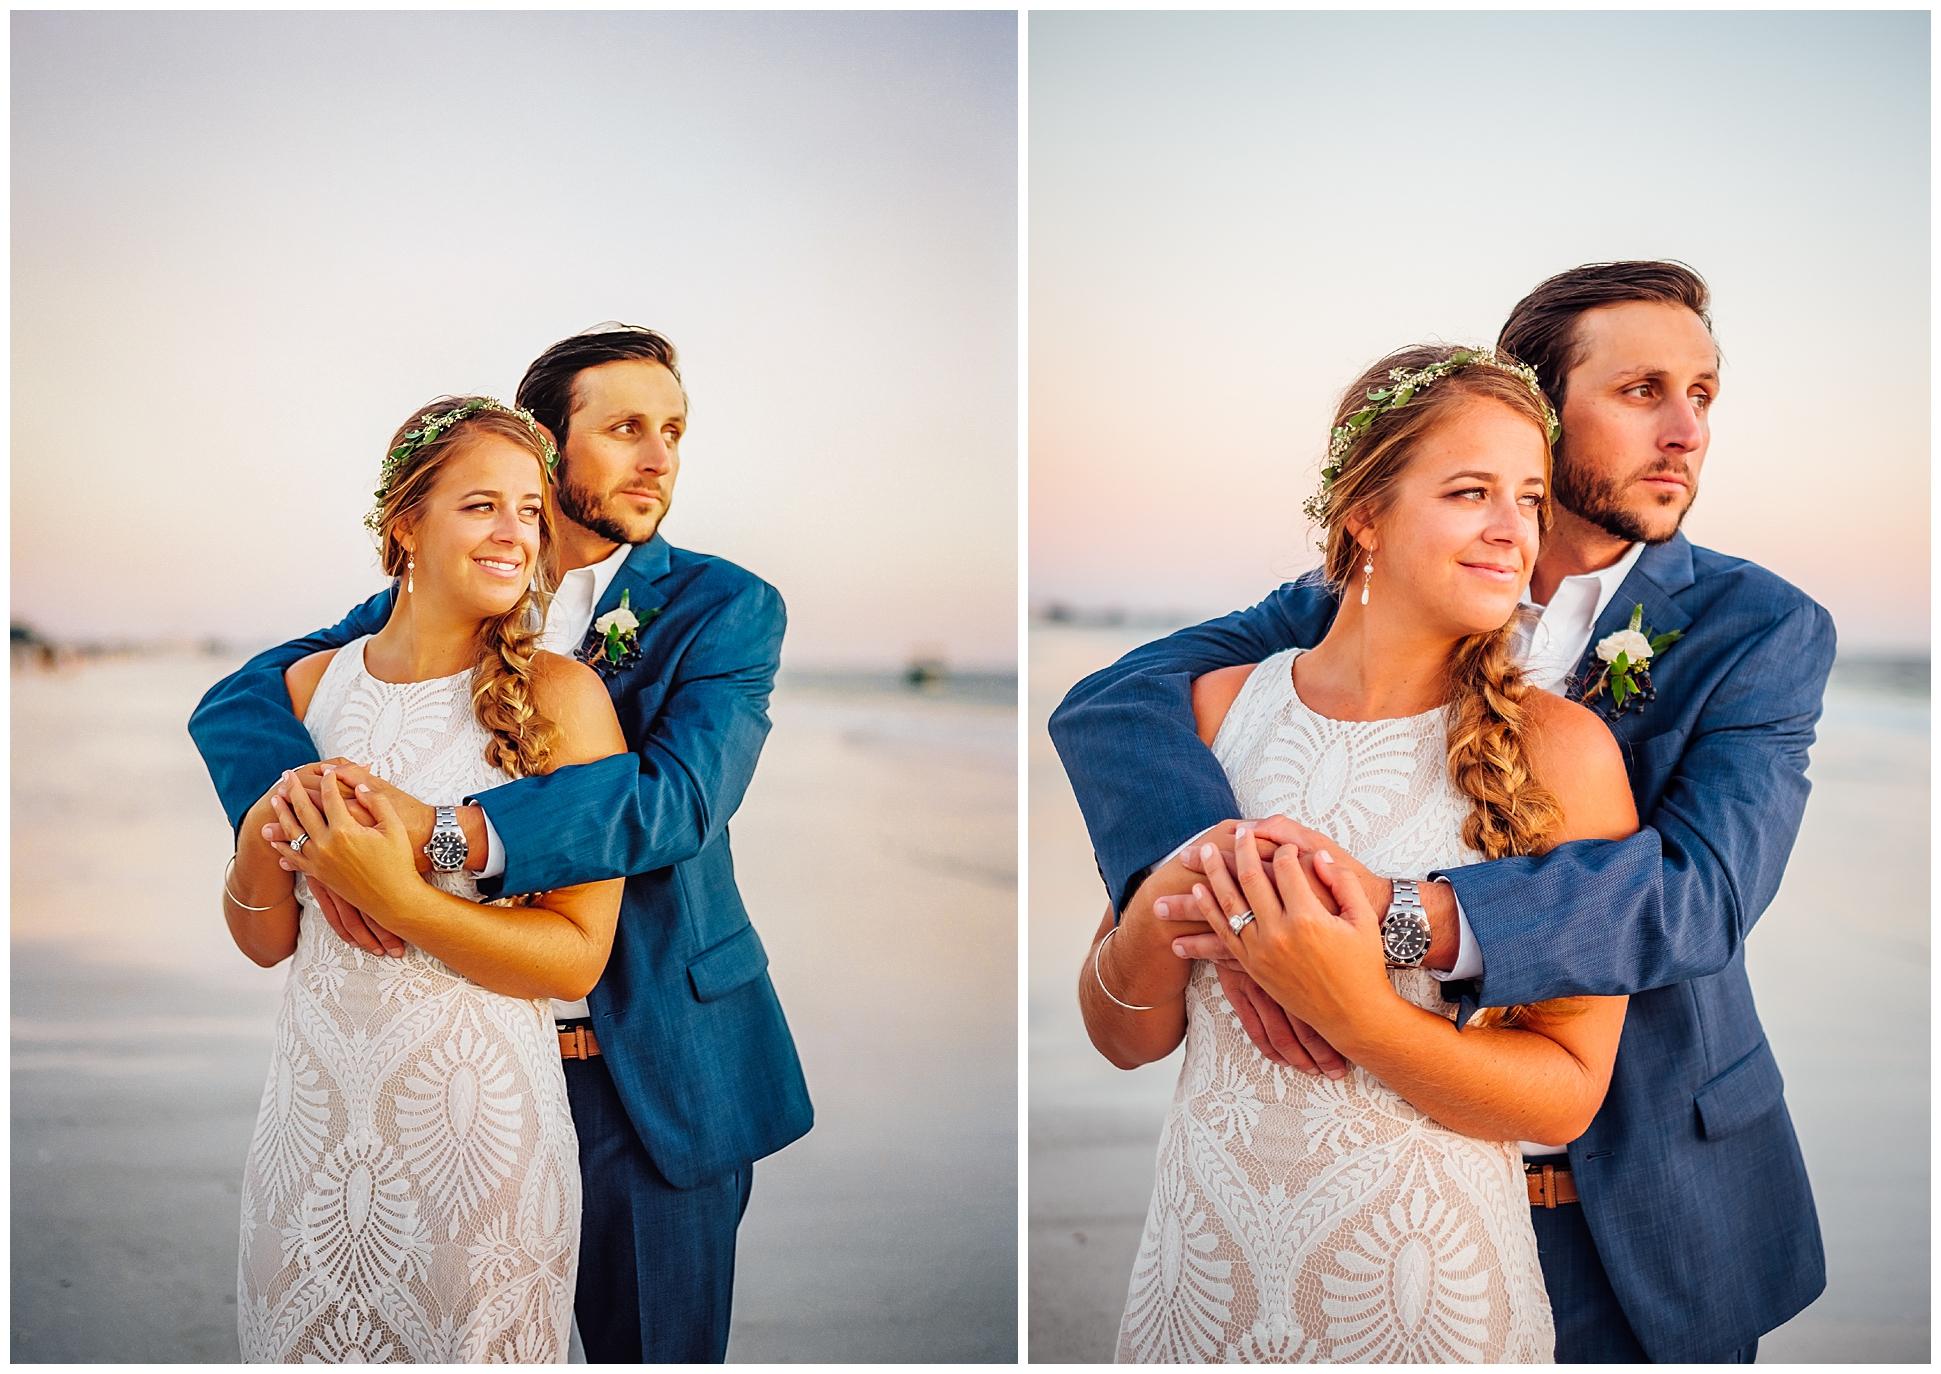 medium-format-film-vs-digital-wedding-photography-florida-beach_0025.jpg